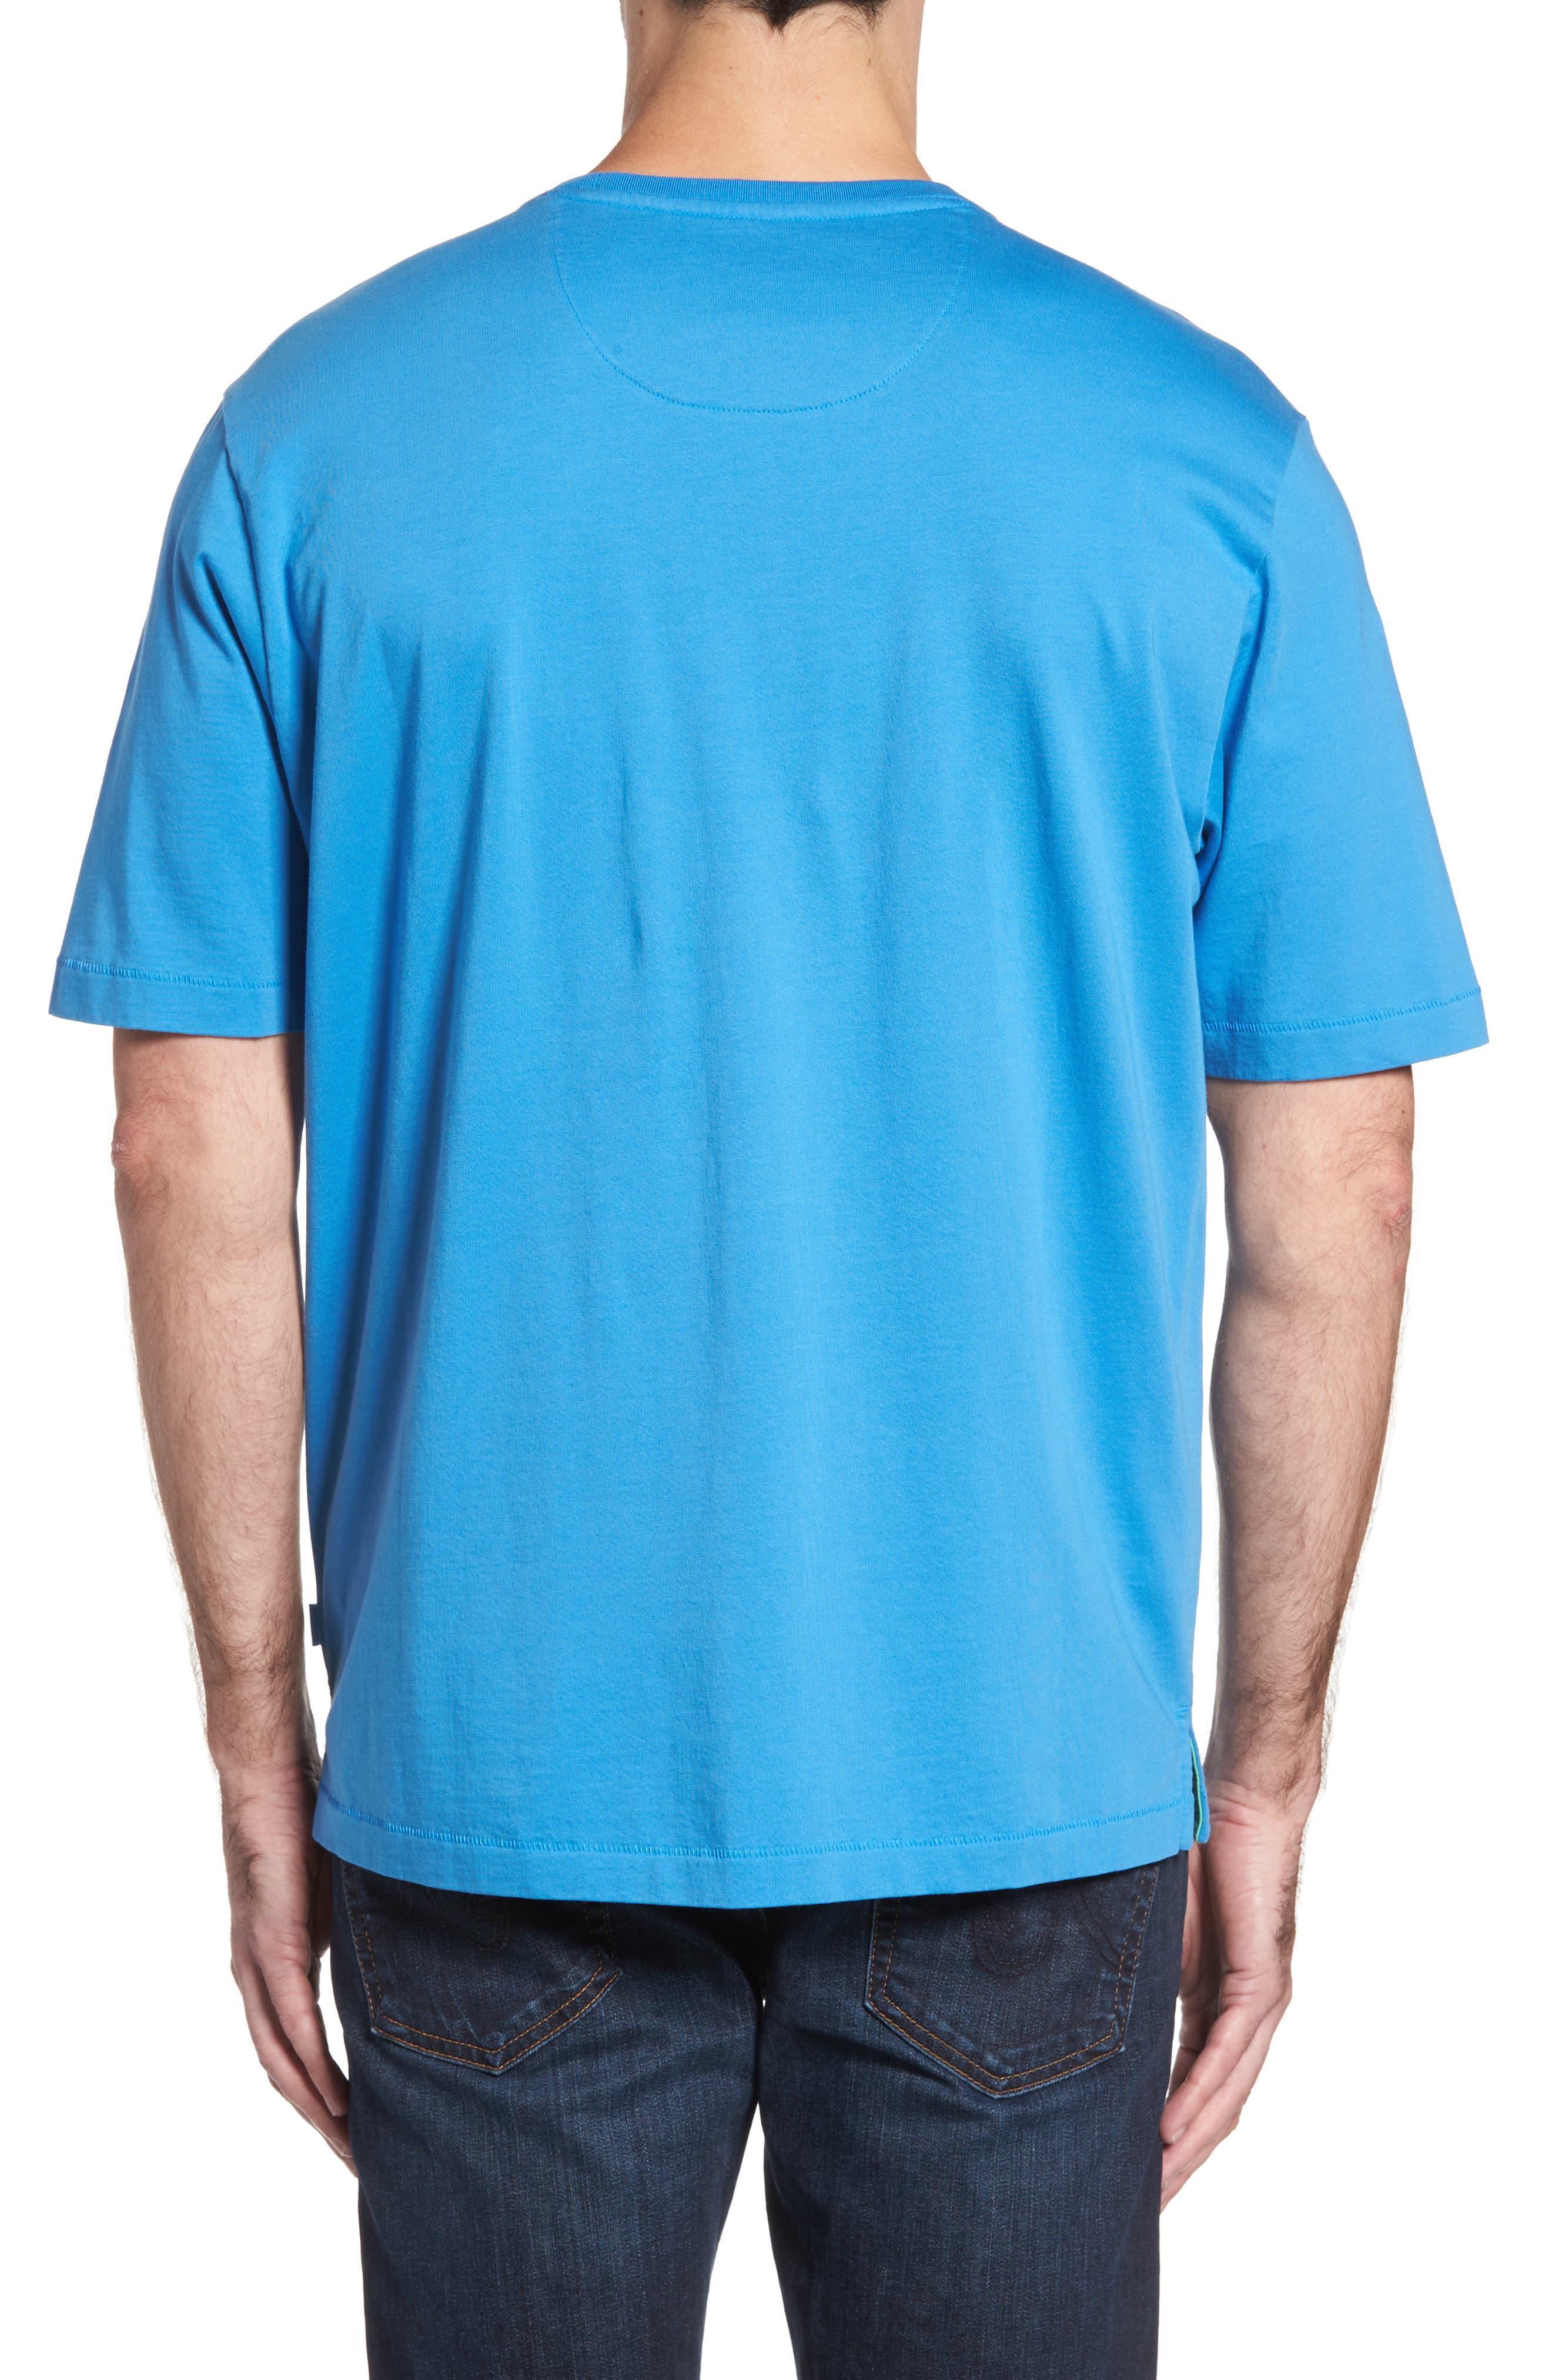 Alternate Image 2  - Tommy Bahama Bali Skyline Pocket T-Shirt